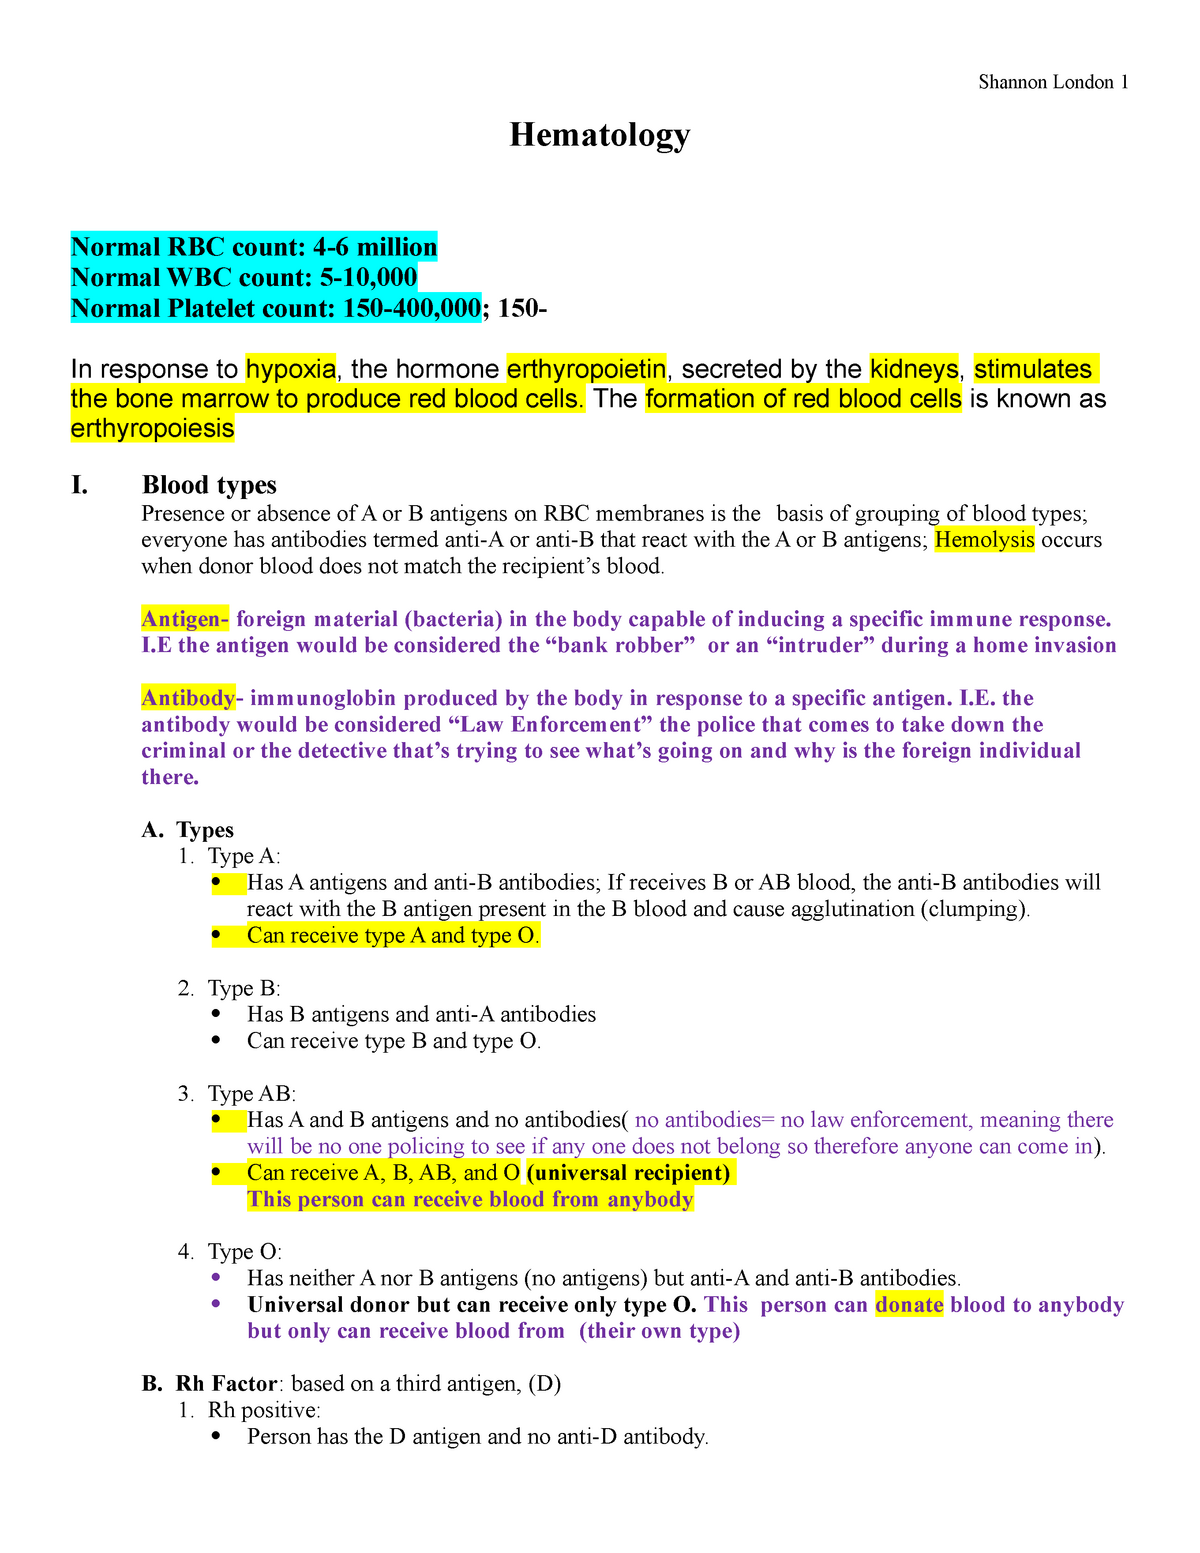 Hematology SL - Chapter test notes - NURS 304 - StuDocu